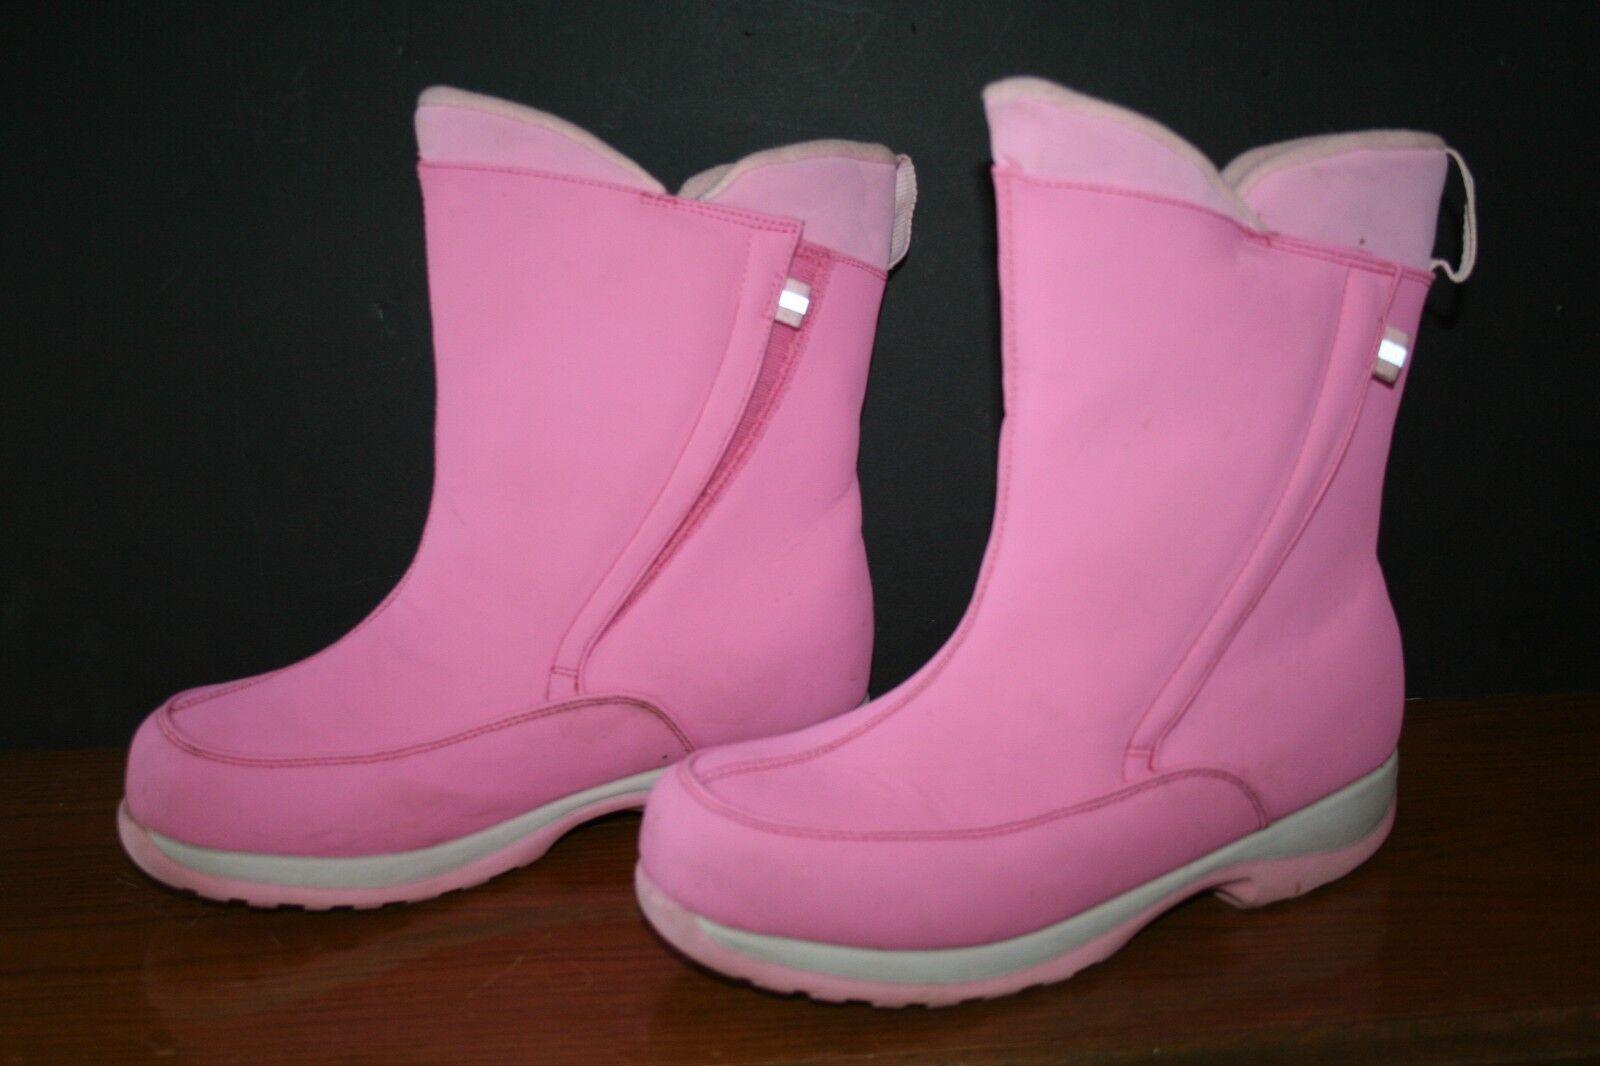 Women's Lands' End Winter Boots 7M PINK EUC Waterproof #30586 Nylon Mid-calf